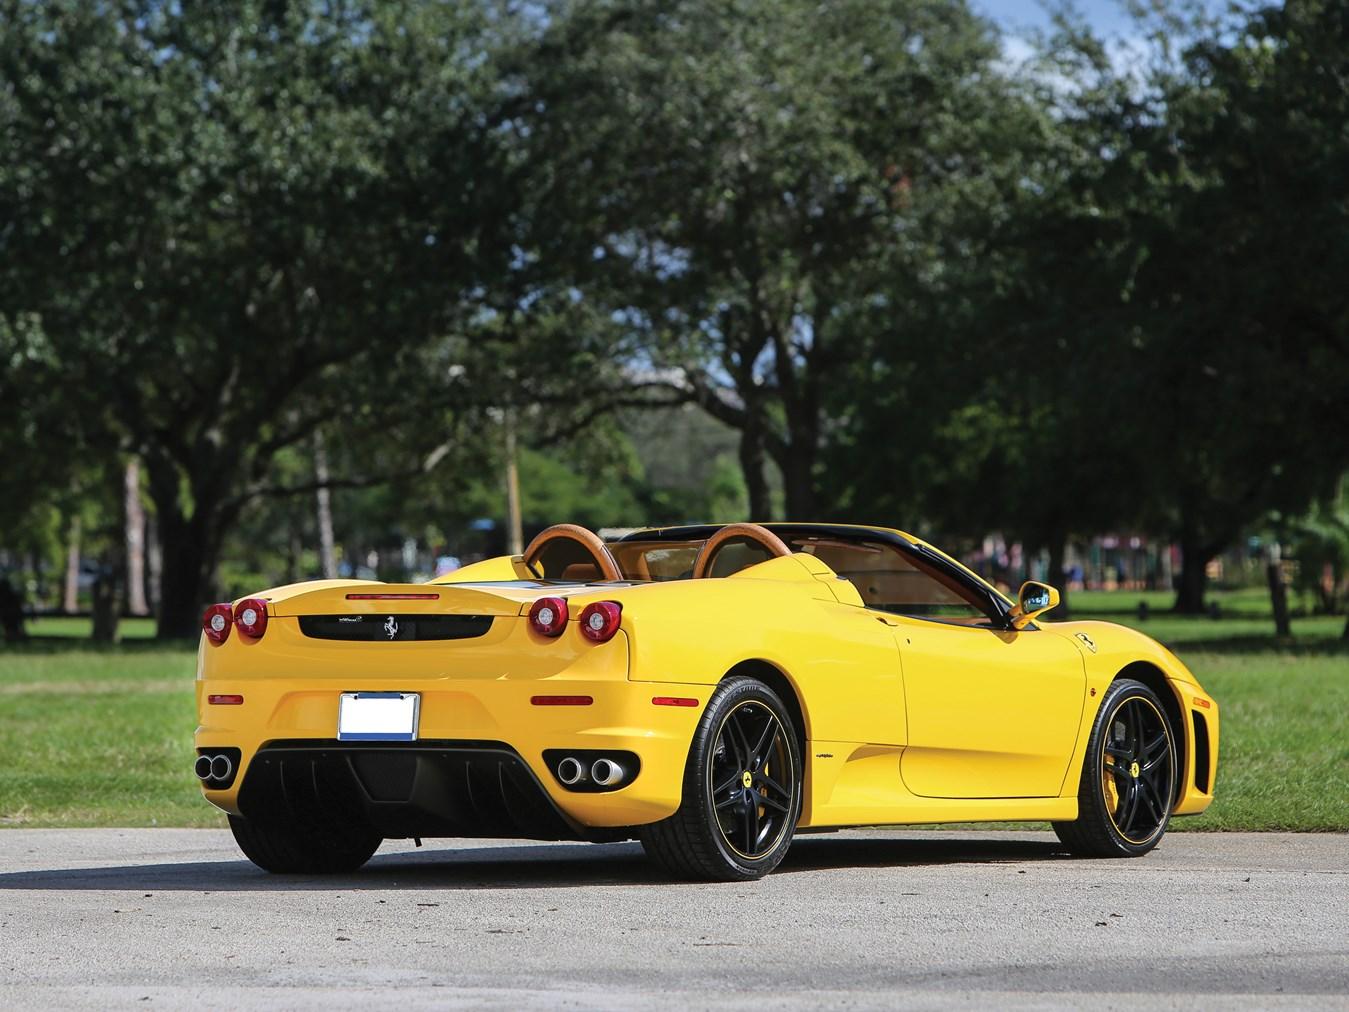 2007 Ferrari F430 Spider yellow rear